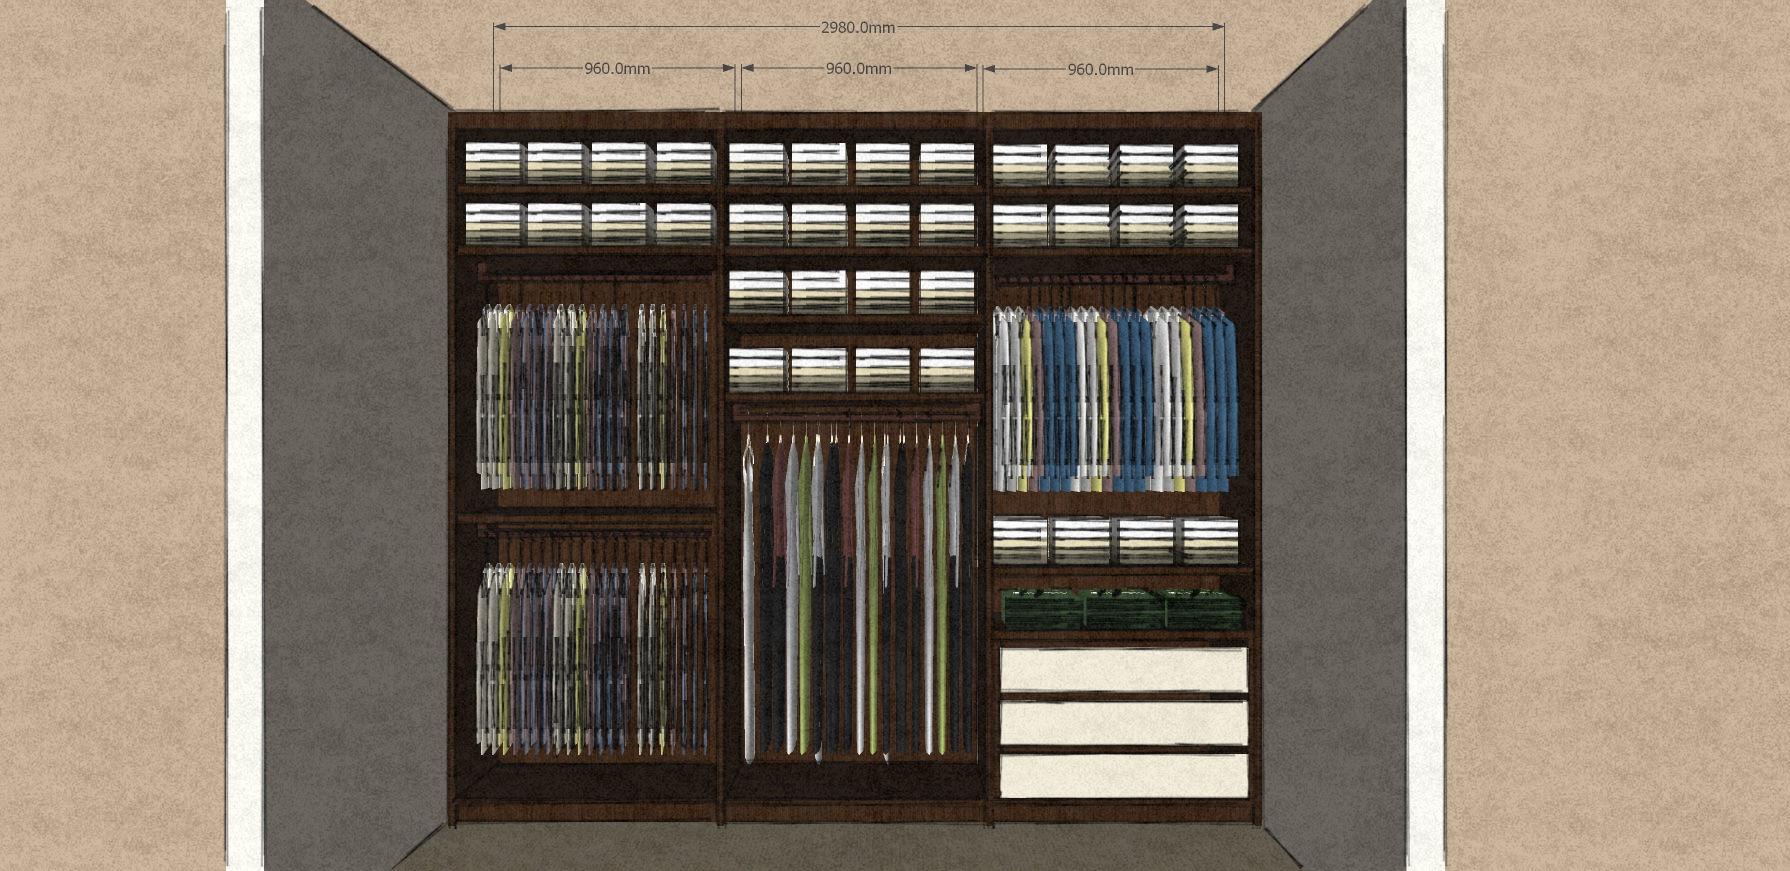 Simon initial bedroom 2 wardrobe design internals.jpg